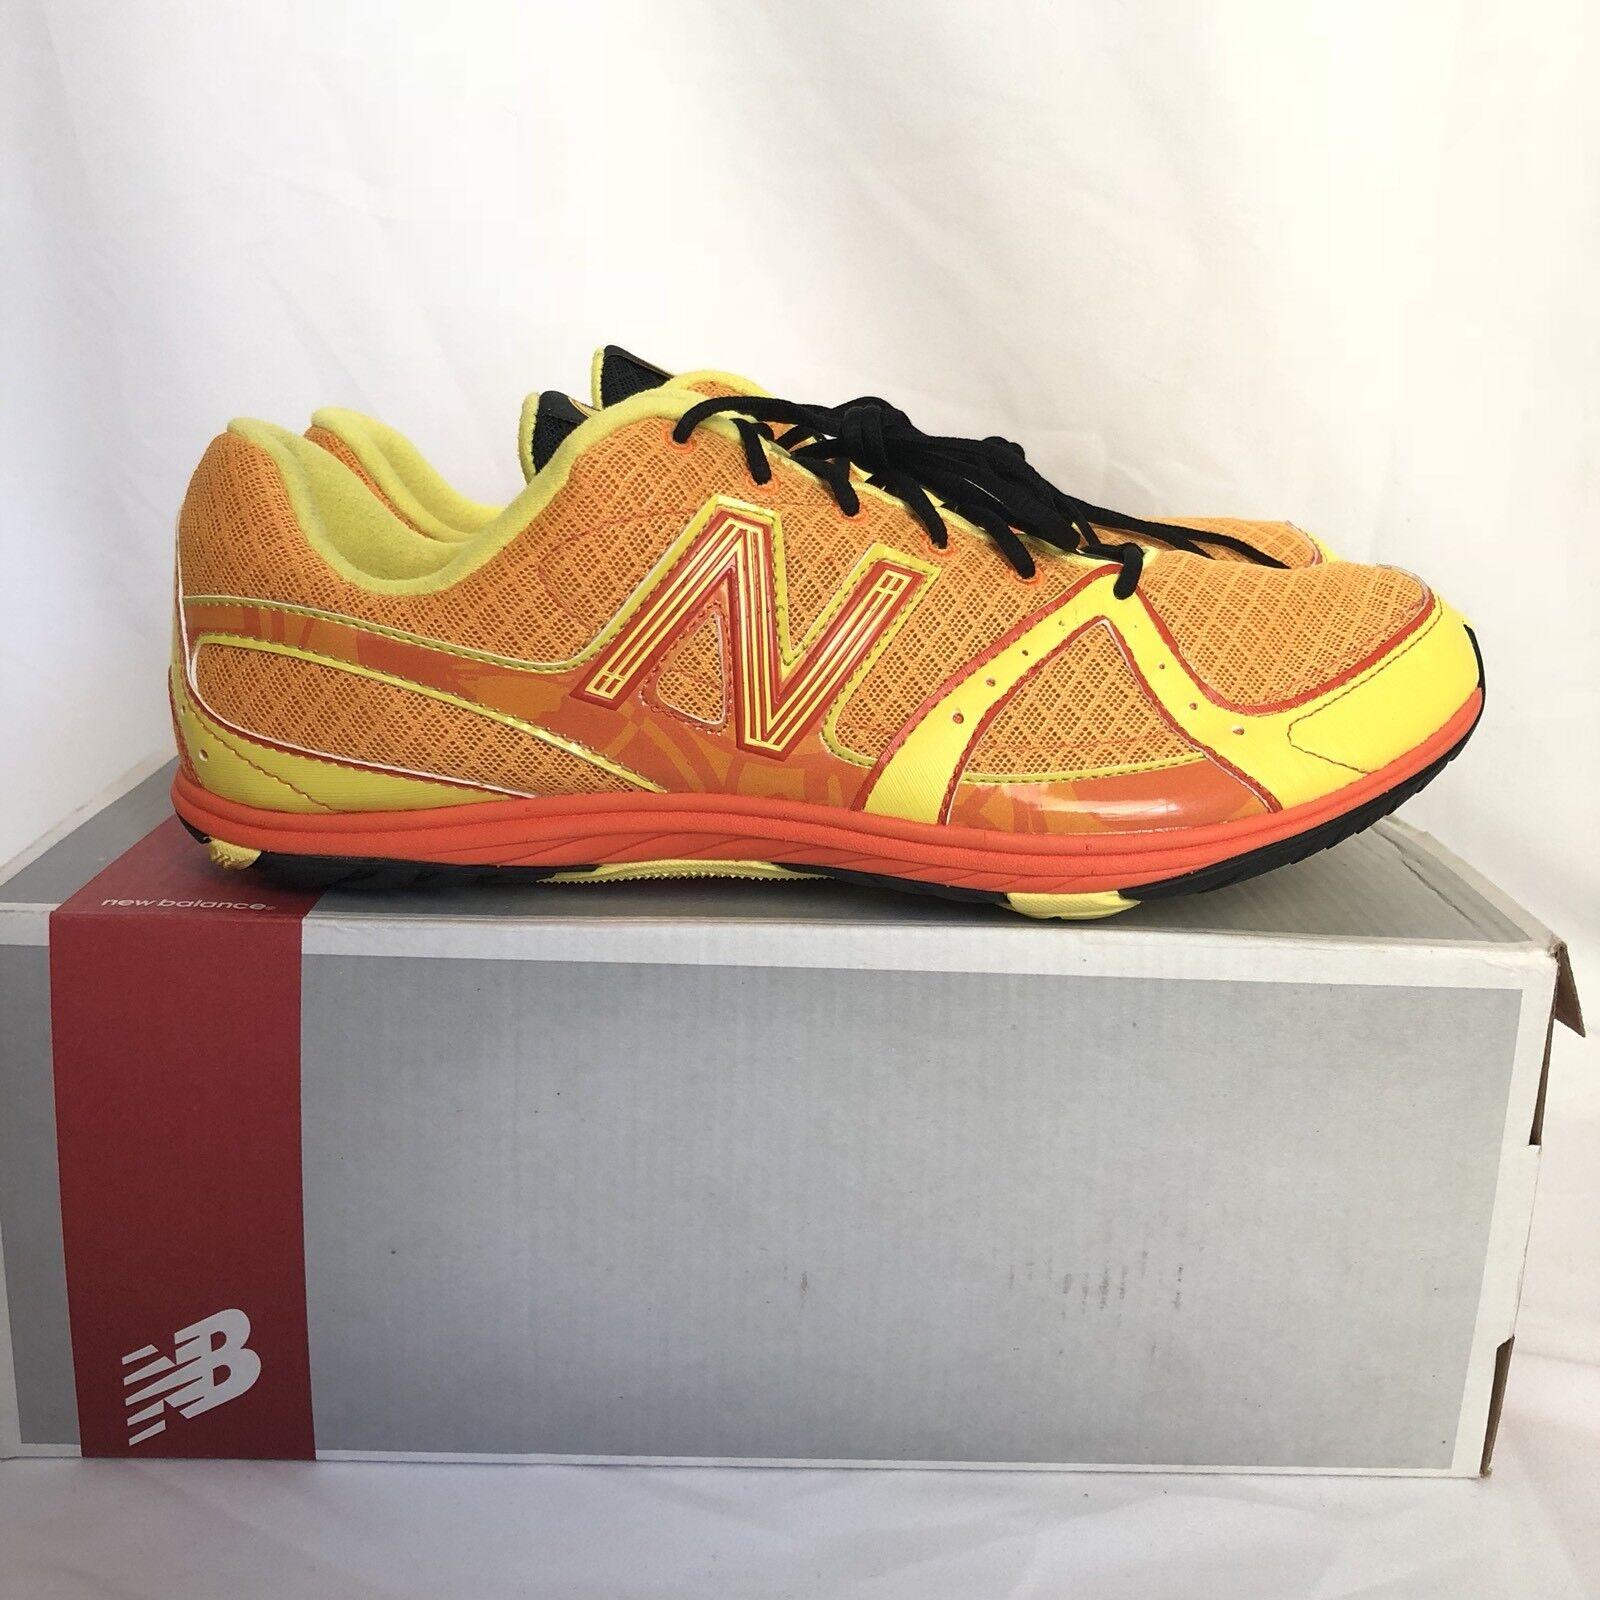 New Balance M700XOR mens running cross training size 10.5